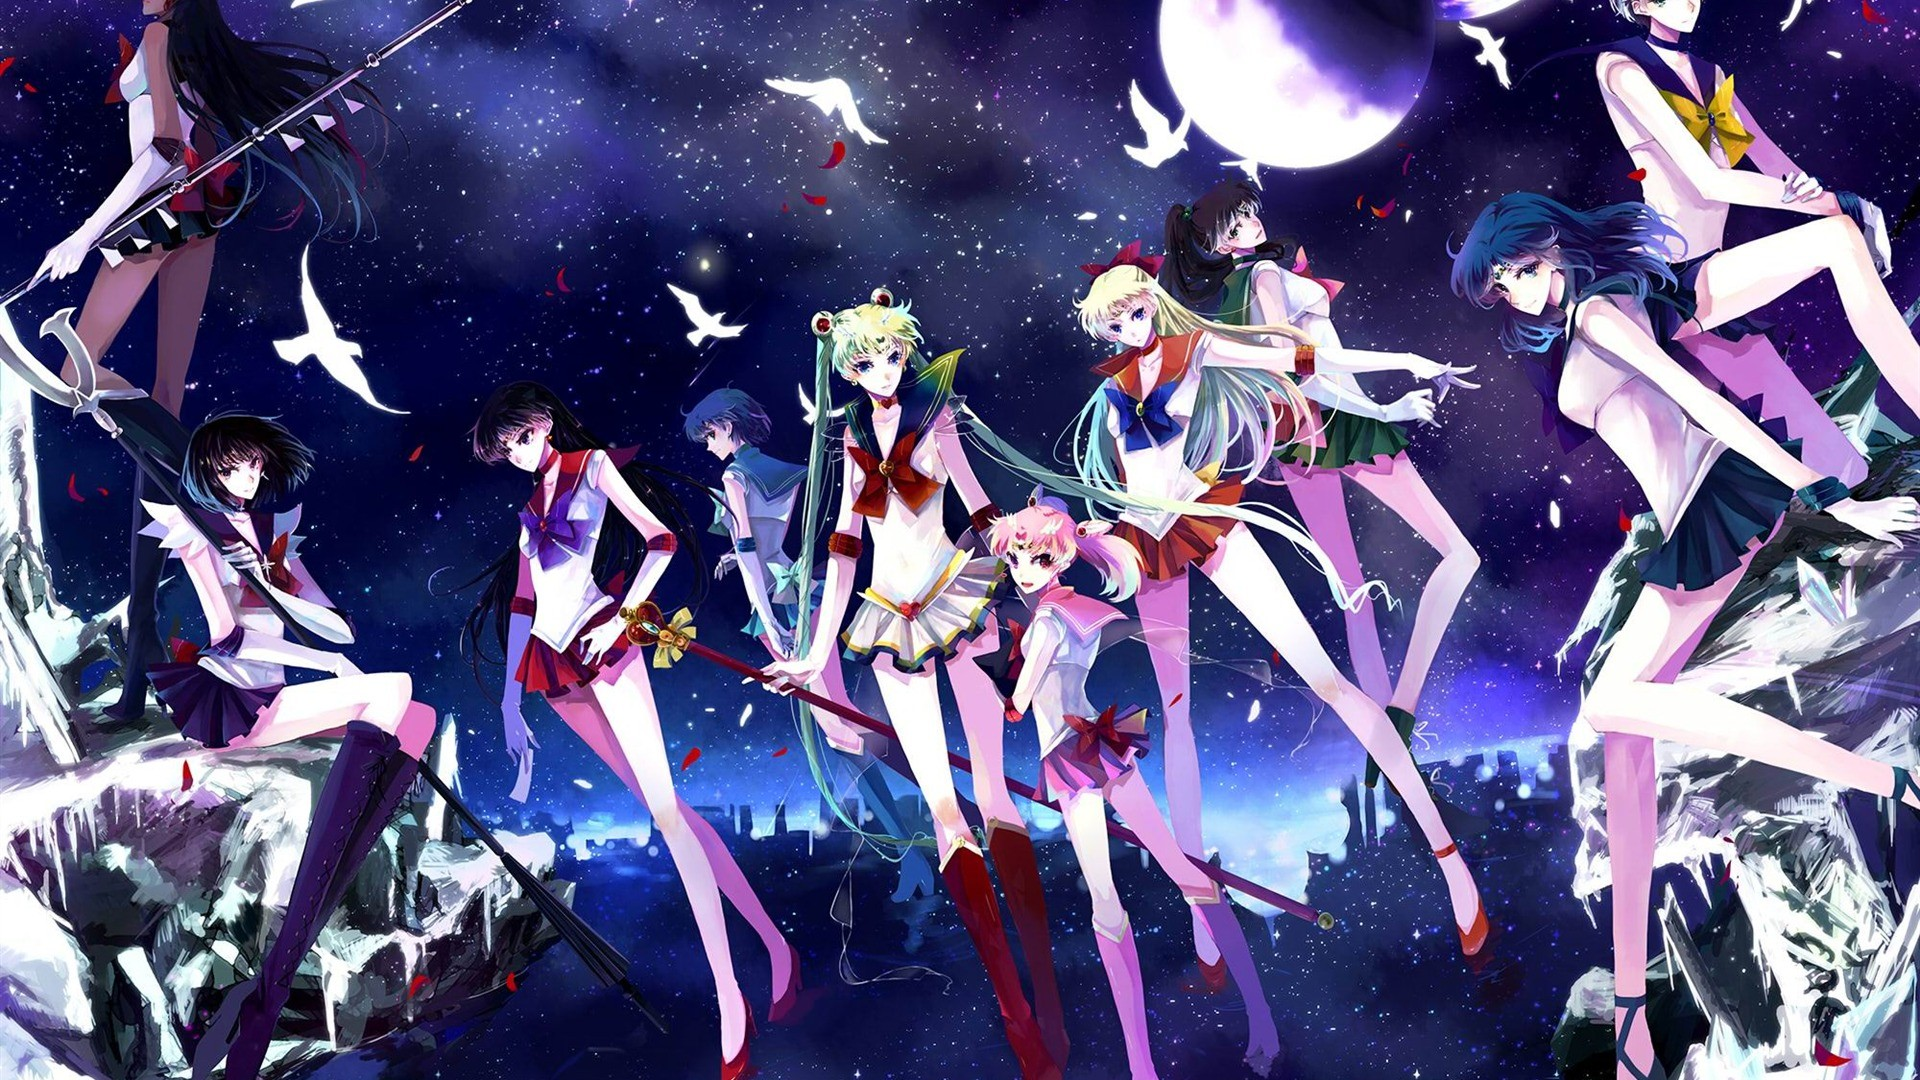 Sailor Moon Anime HD wallpaper 04 – wallpaper download .